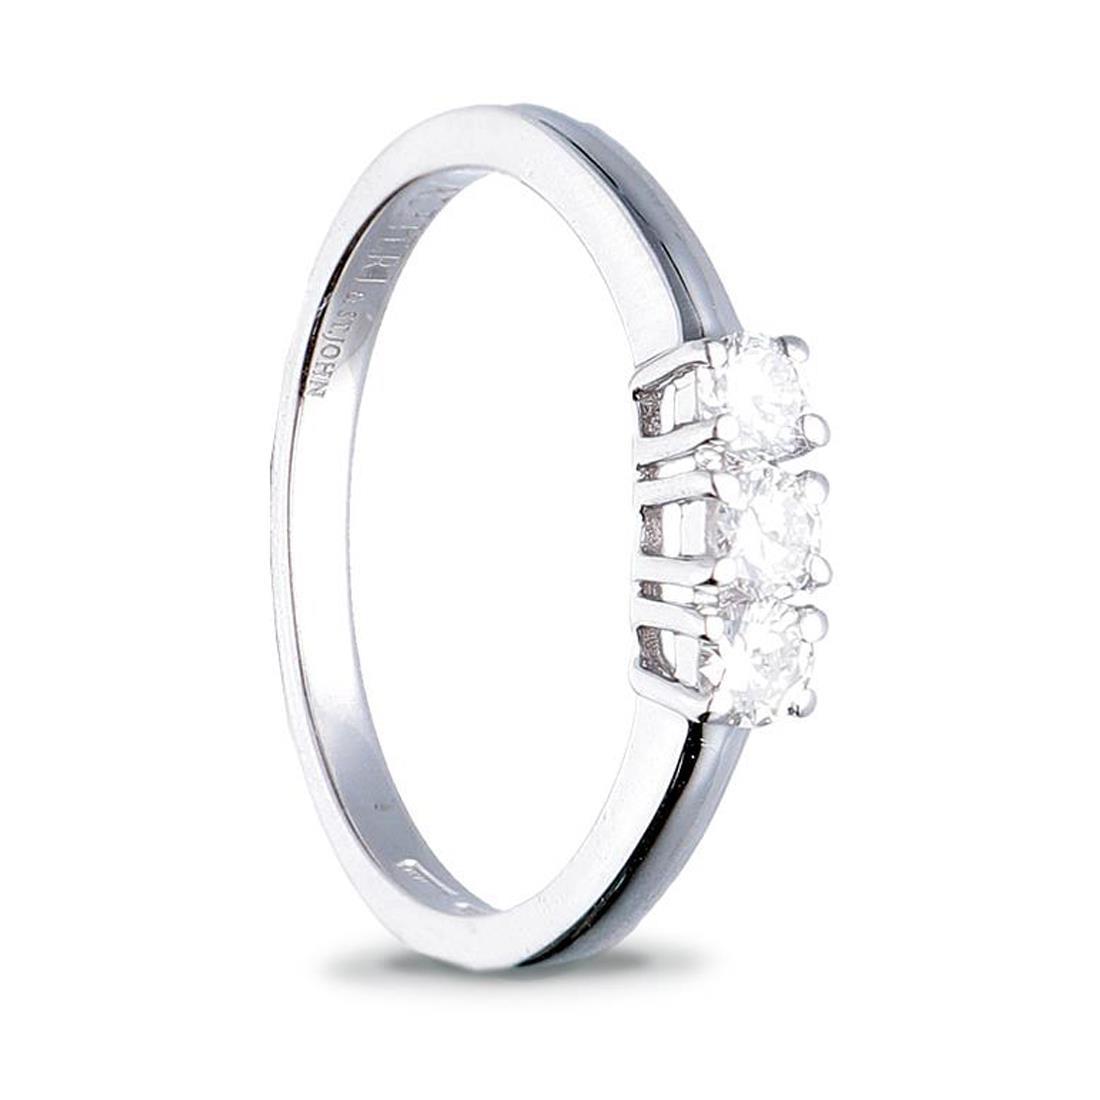 Anello trilogy con diamanti ct. 0,30 - ALFIERI & ST. JOHN